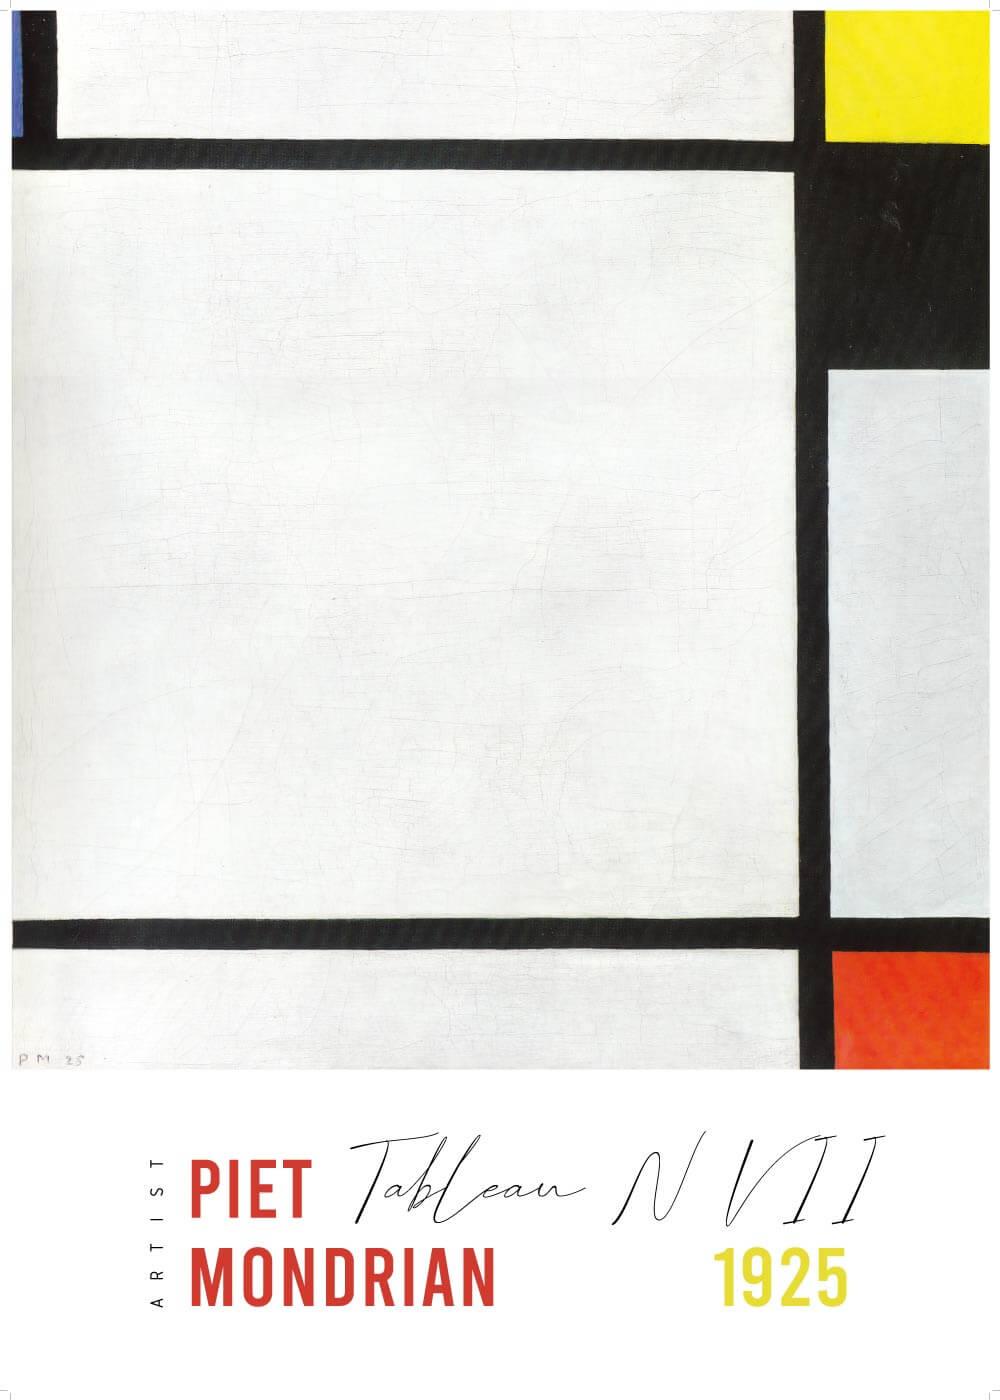 Billede af Tablean N Vll - Piet Mondrian